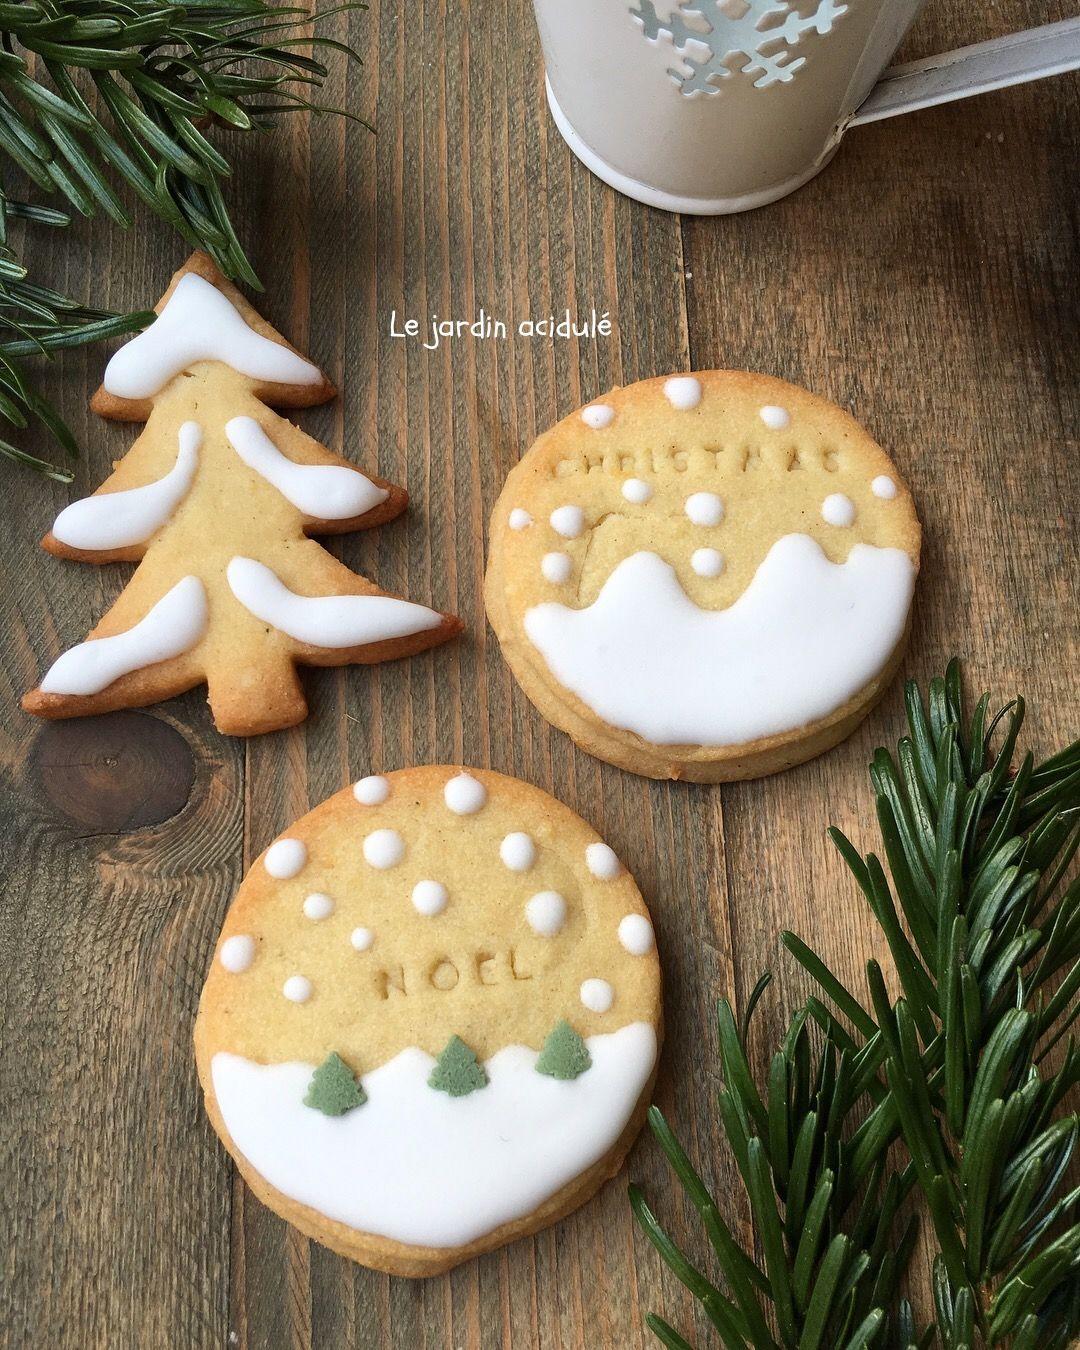 Decoration Biscuit Noel.Biscuits Noël Christmas Cookies Christmas Sweets